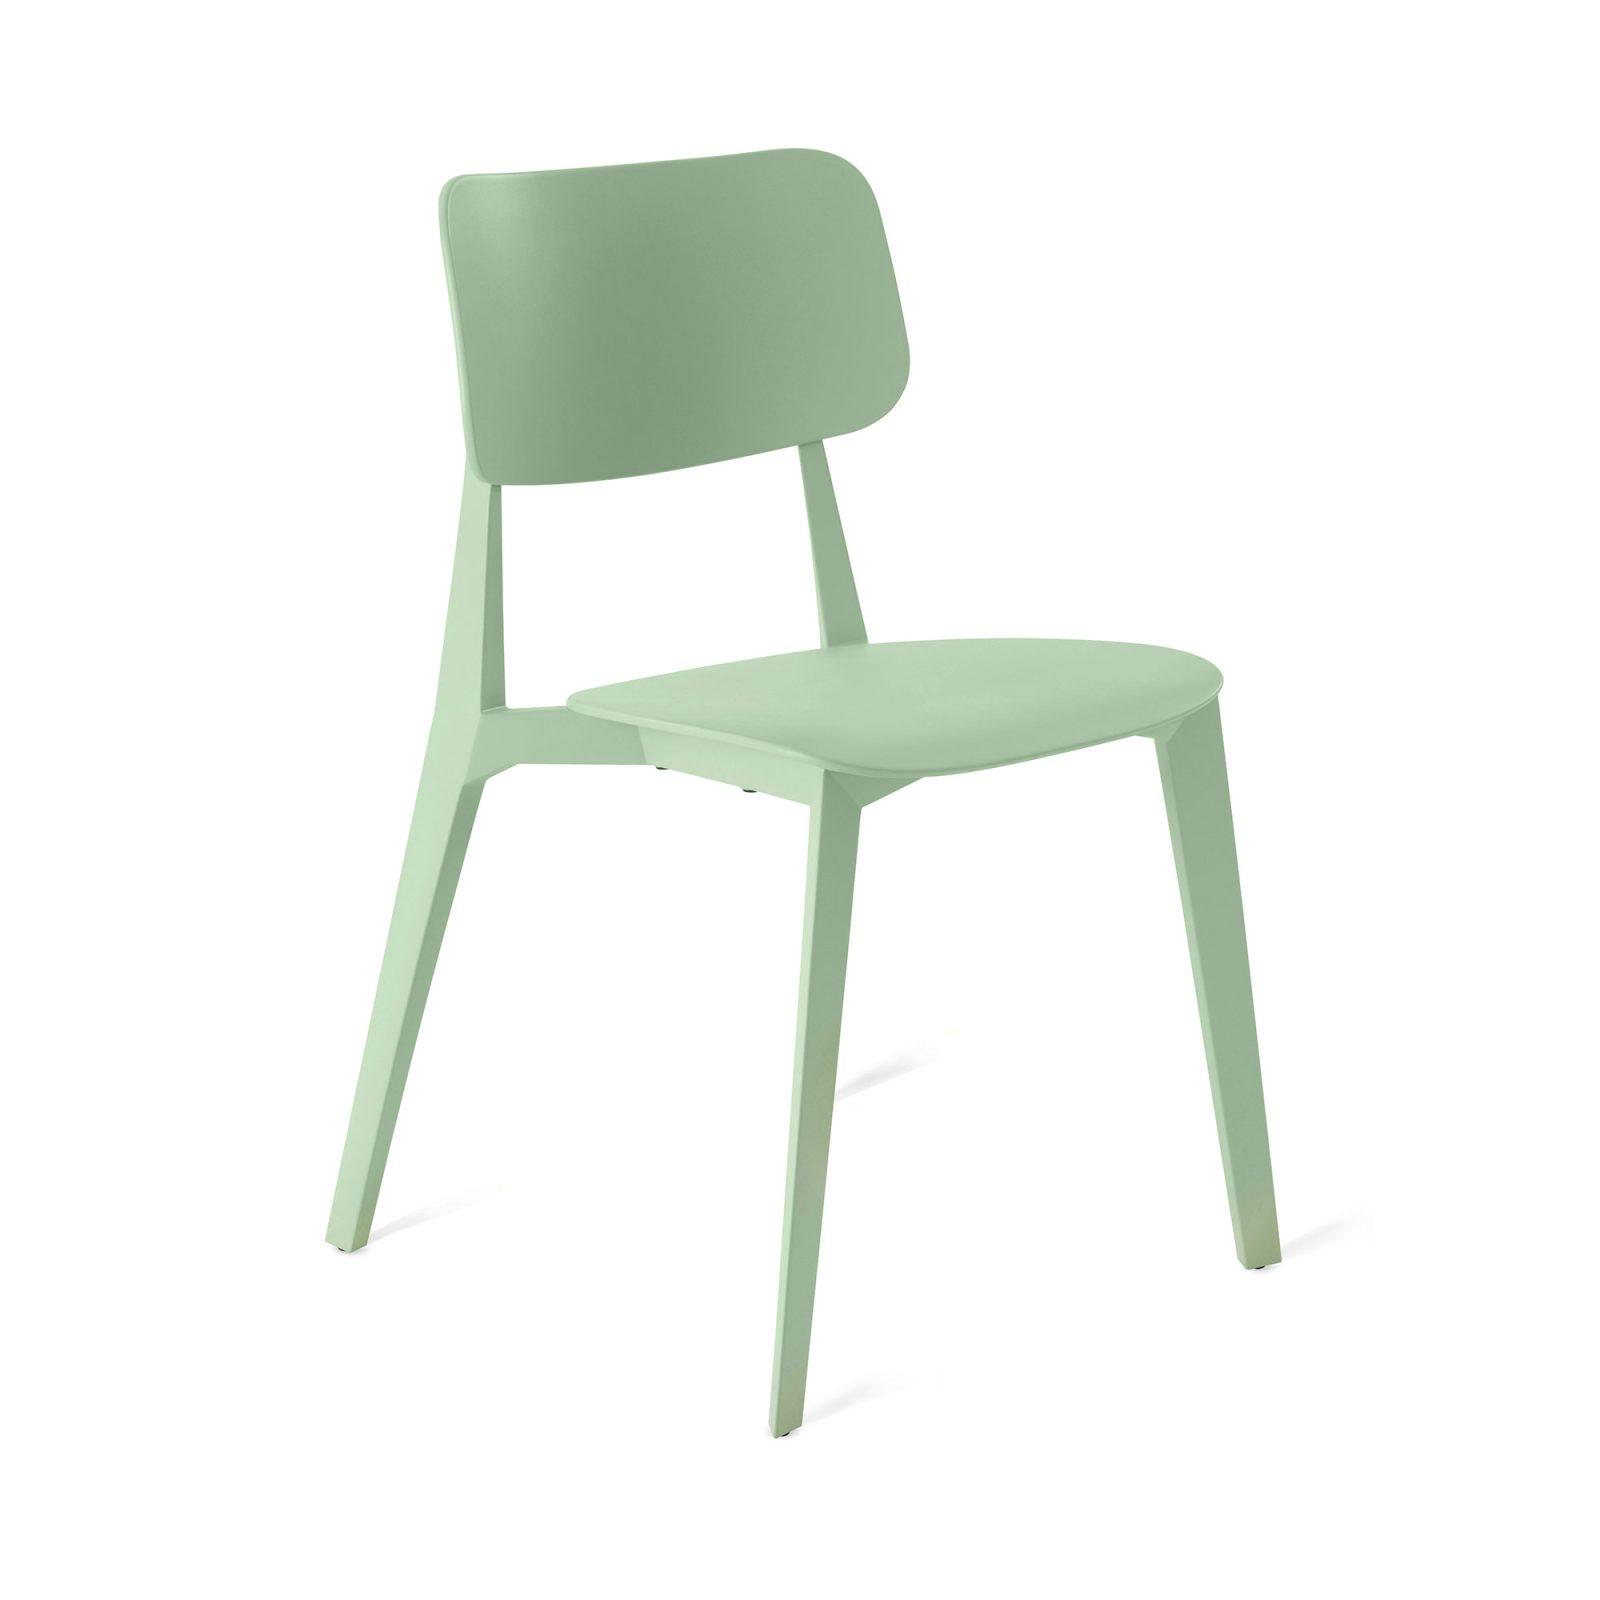 stellar-chair-mint-green-8